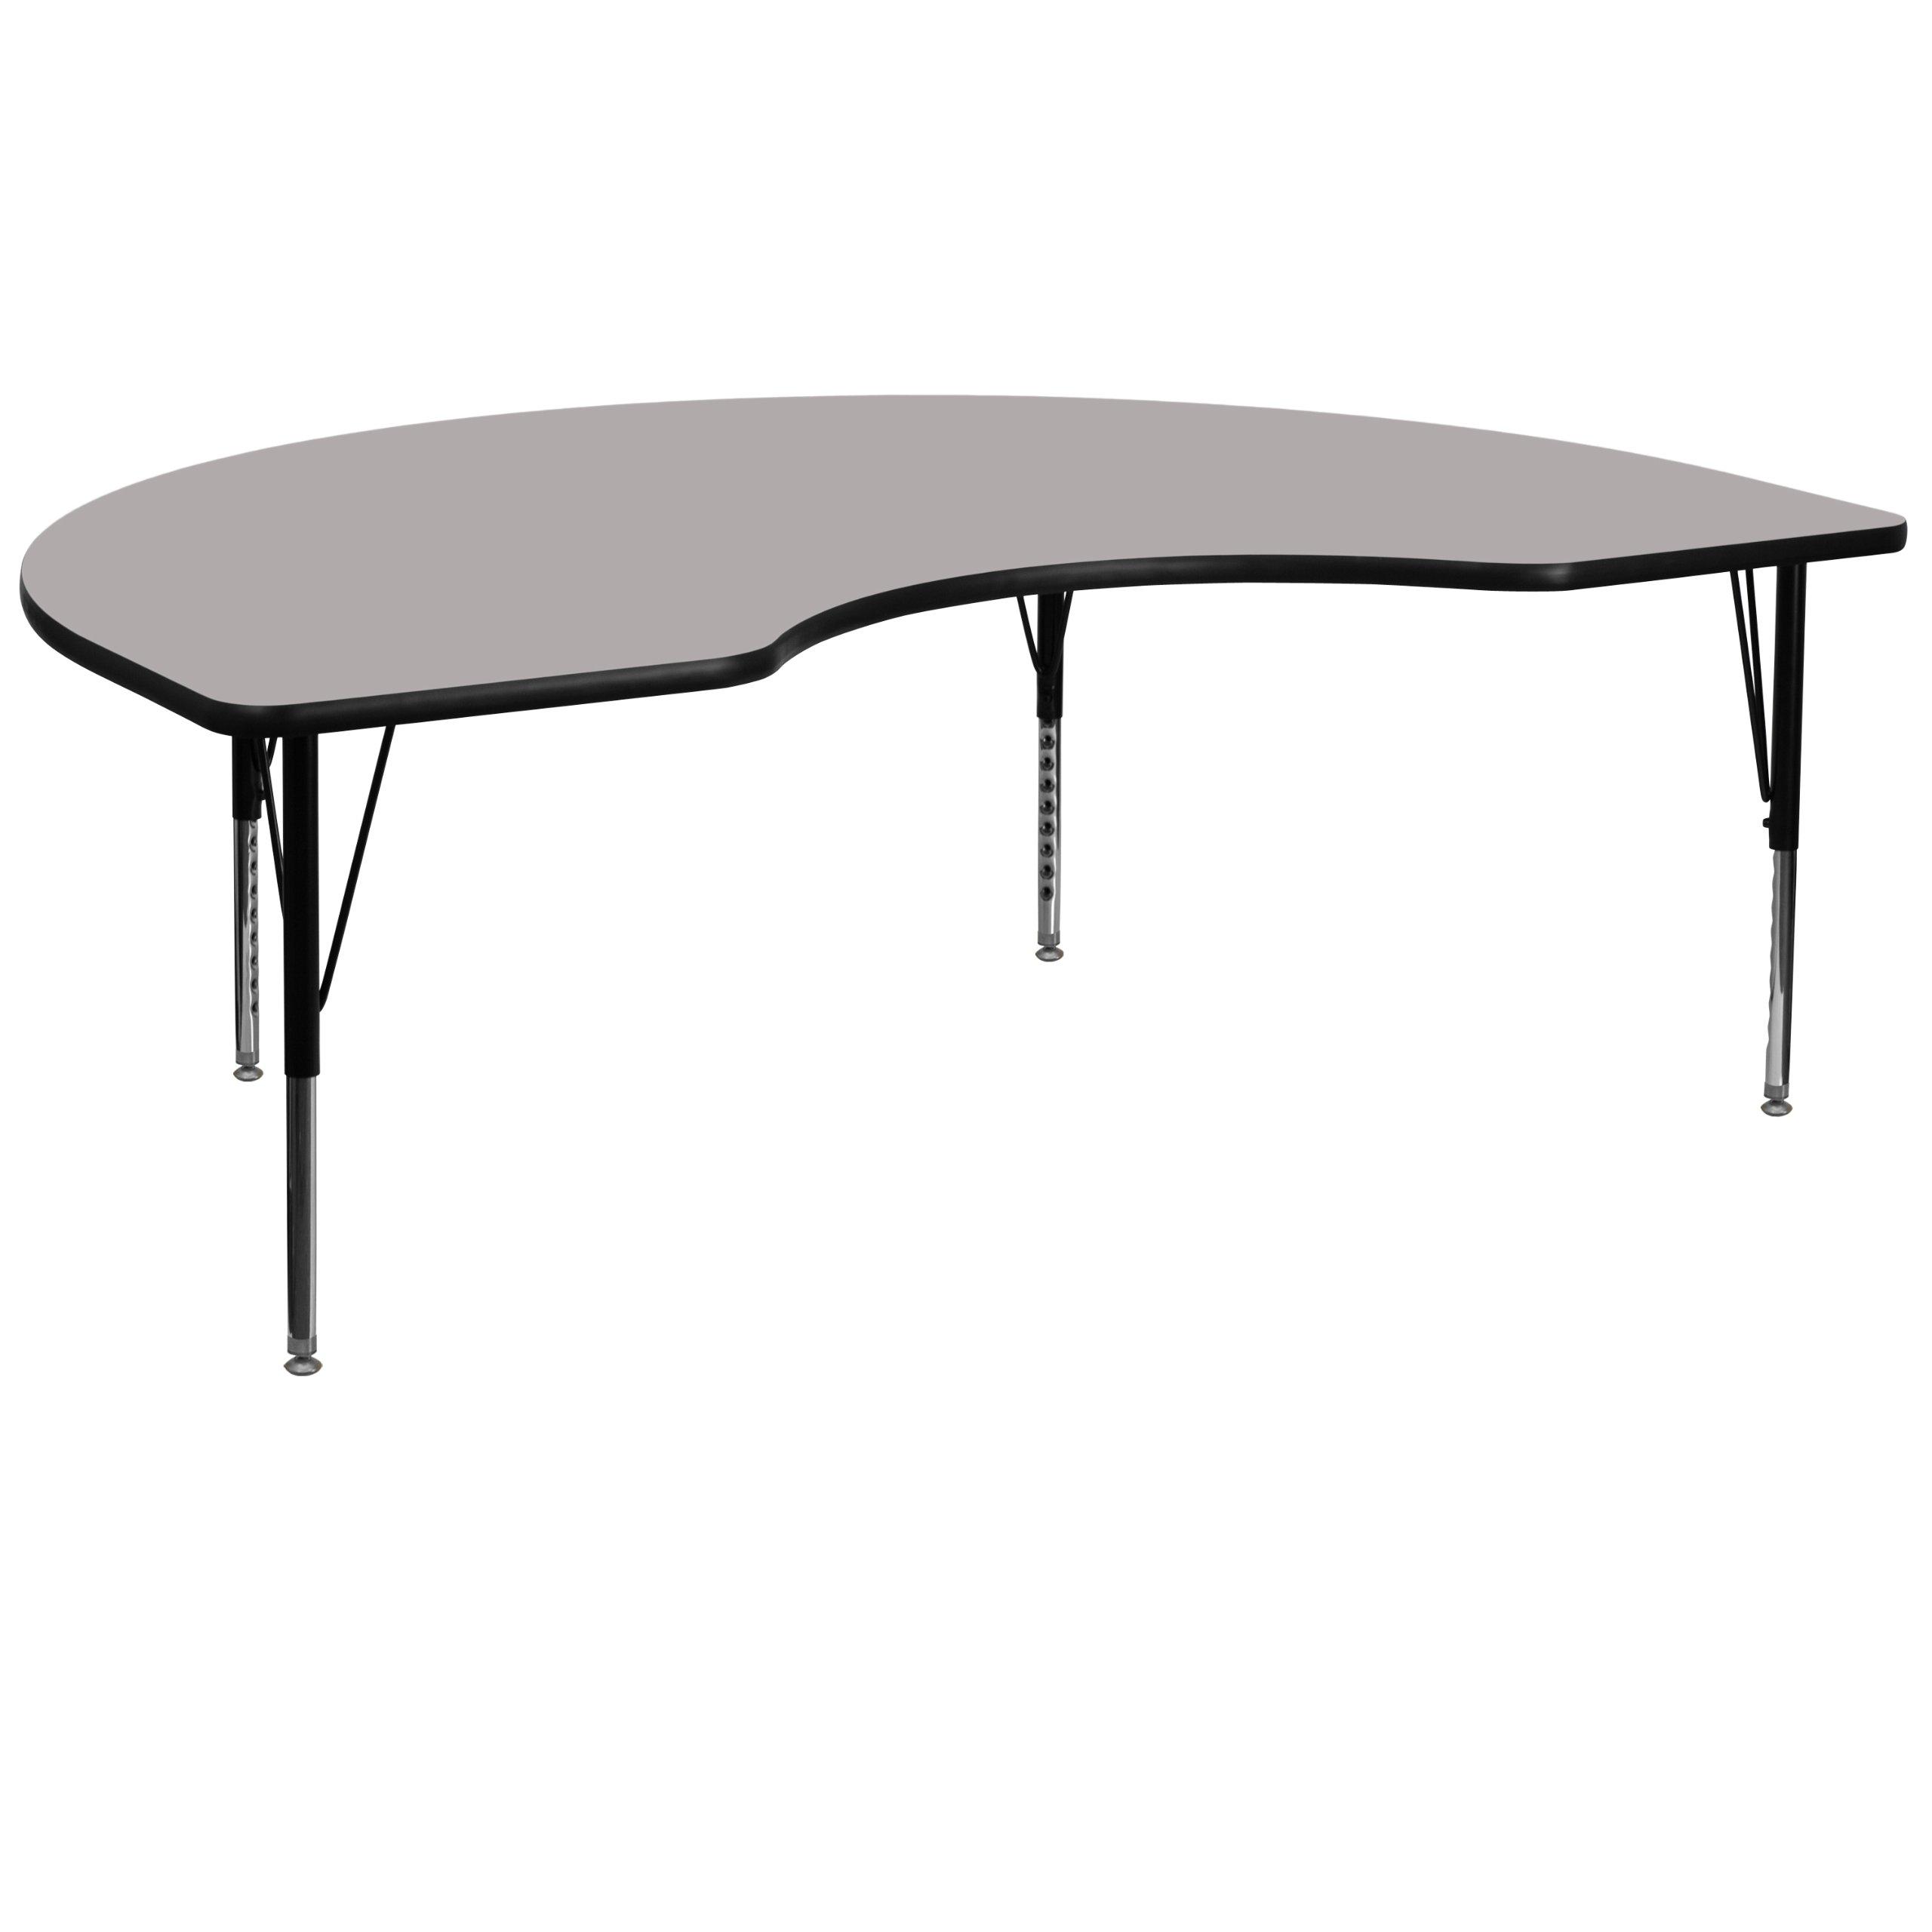 Flash Furniture 48''W x 96''L Kidney Grey HP Laminate Activity Table - Height Adjustable Short Legs